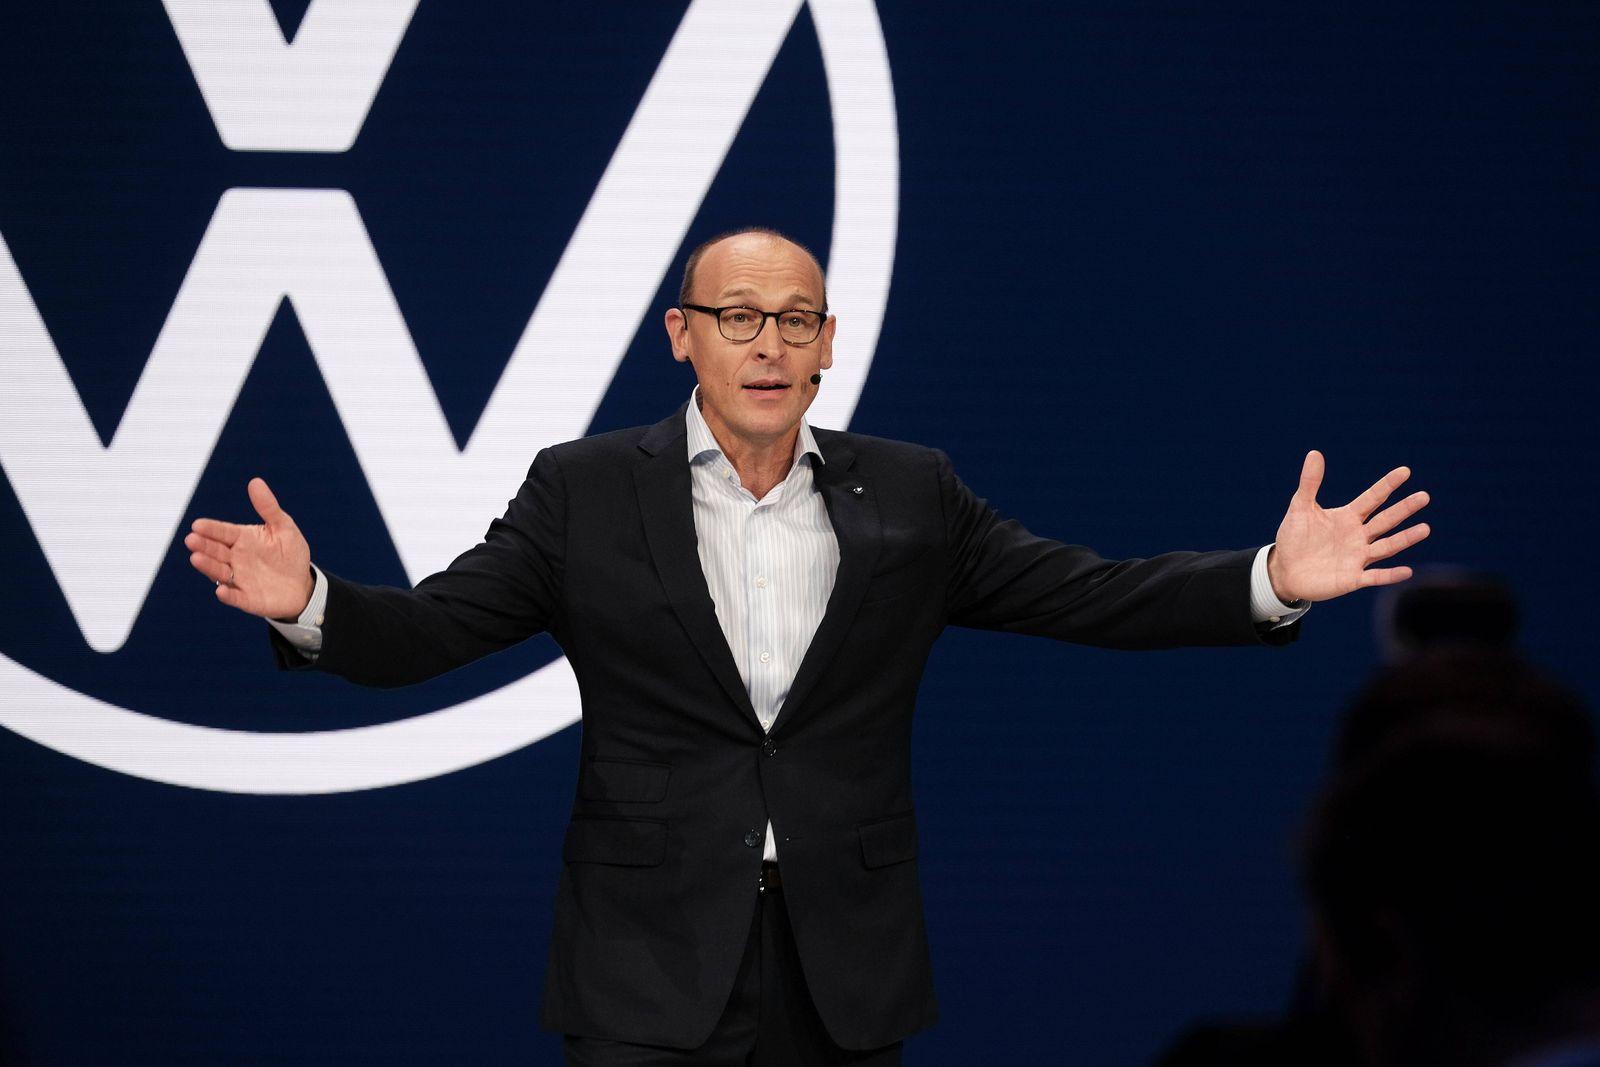 10.09.2019 xkhx Frankfurt am Main, Messe Internationale Automobilausstellung IAA 2019 unter dem Leitmotiv Driving Tomor